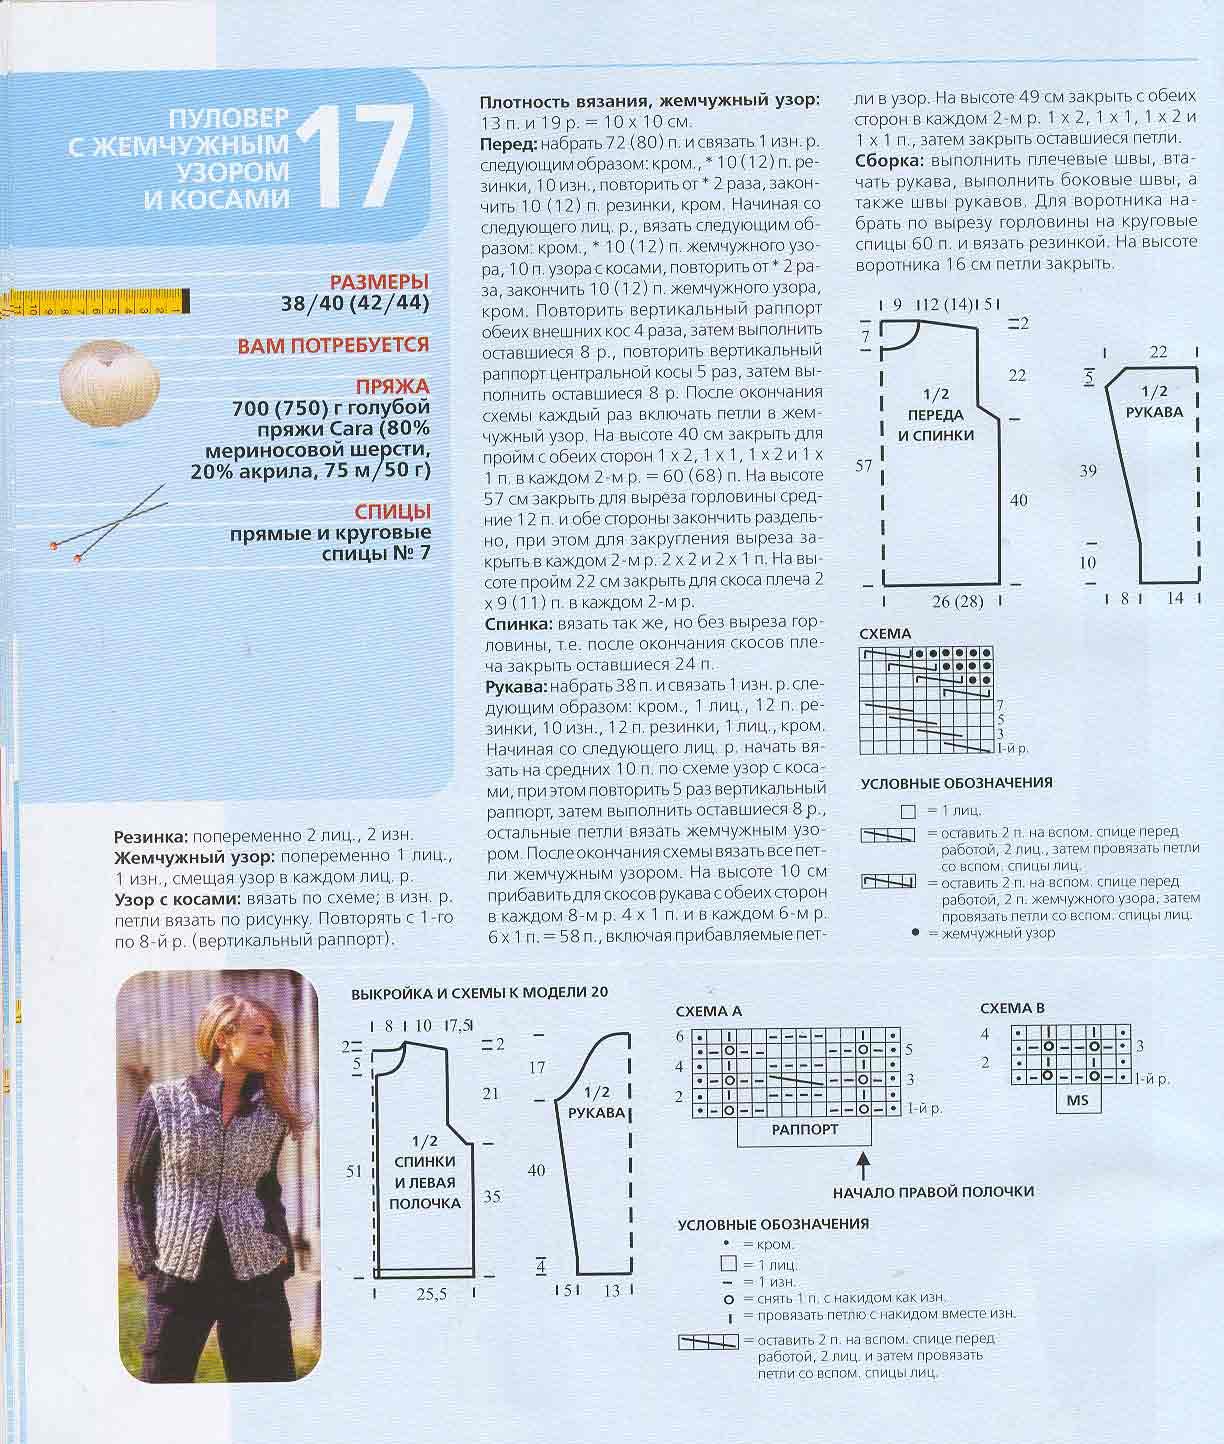 3ds max 2014 дизайн интерьеров и архитектуры